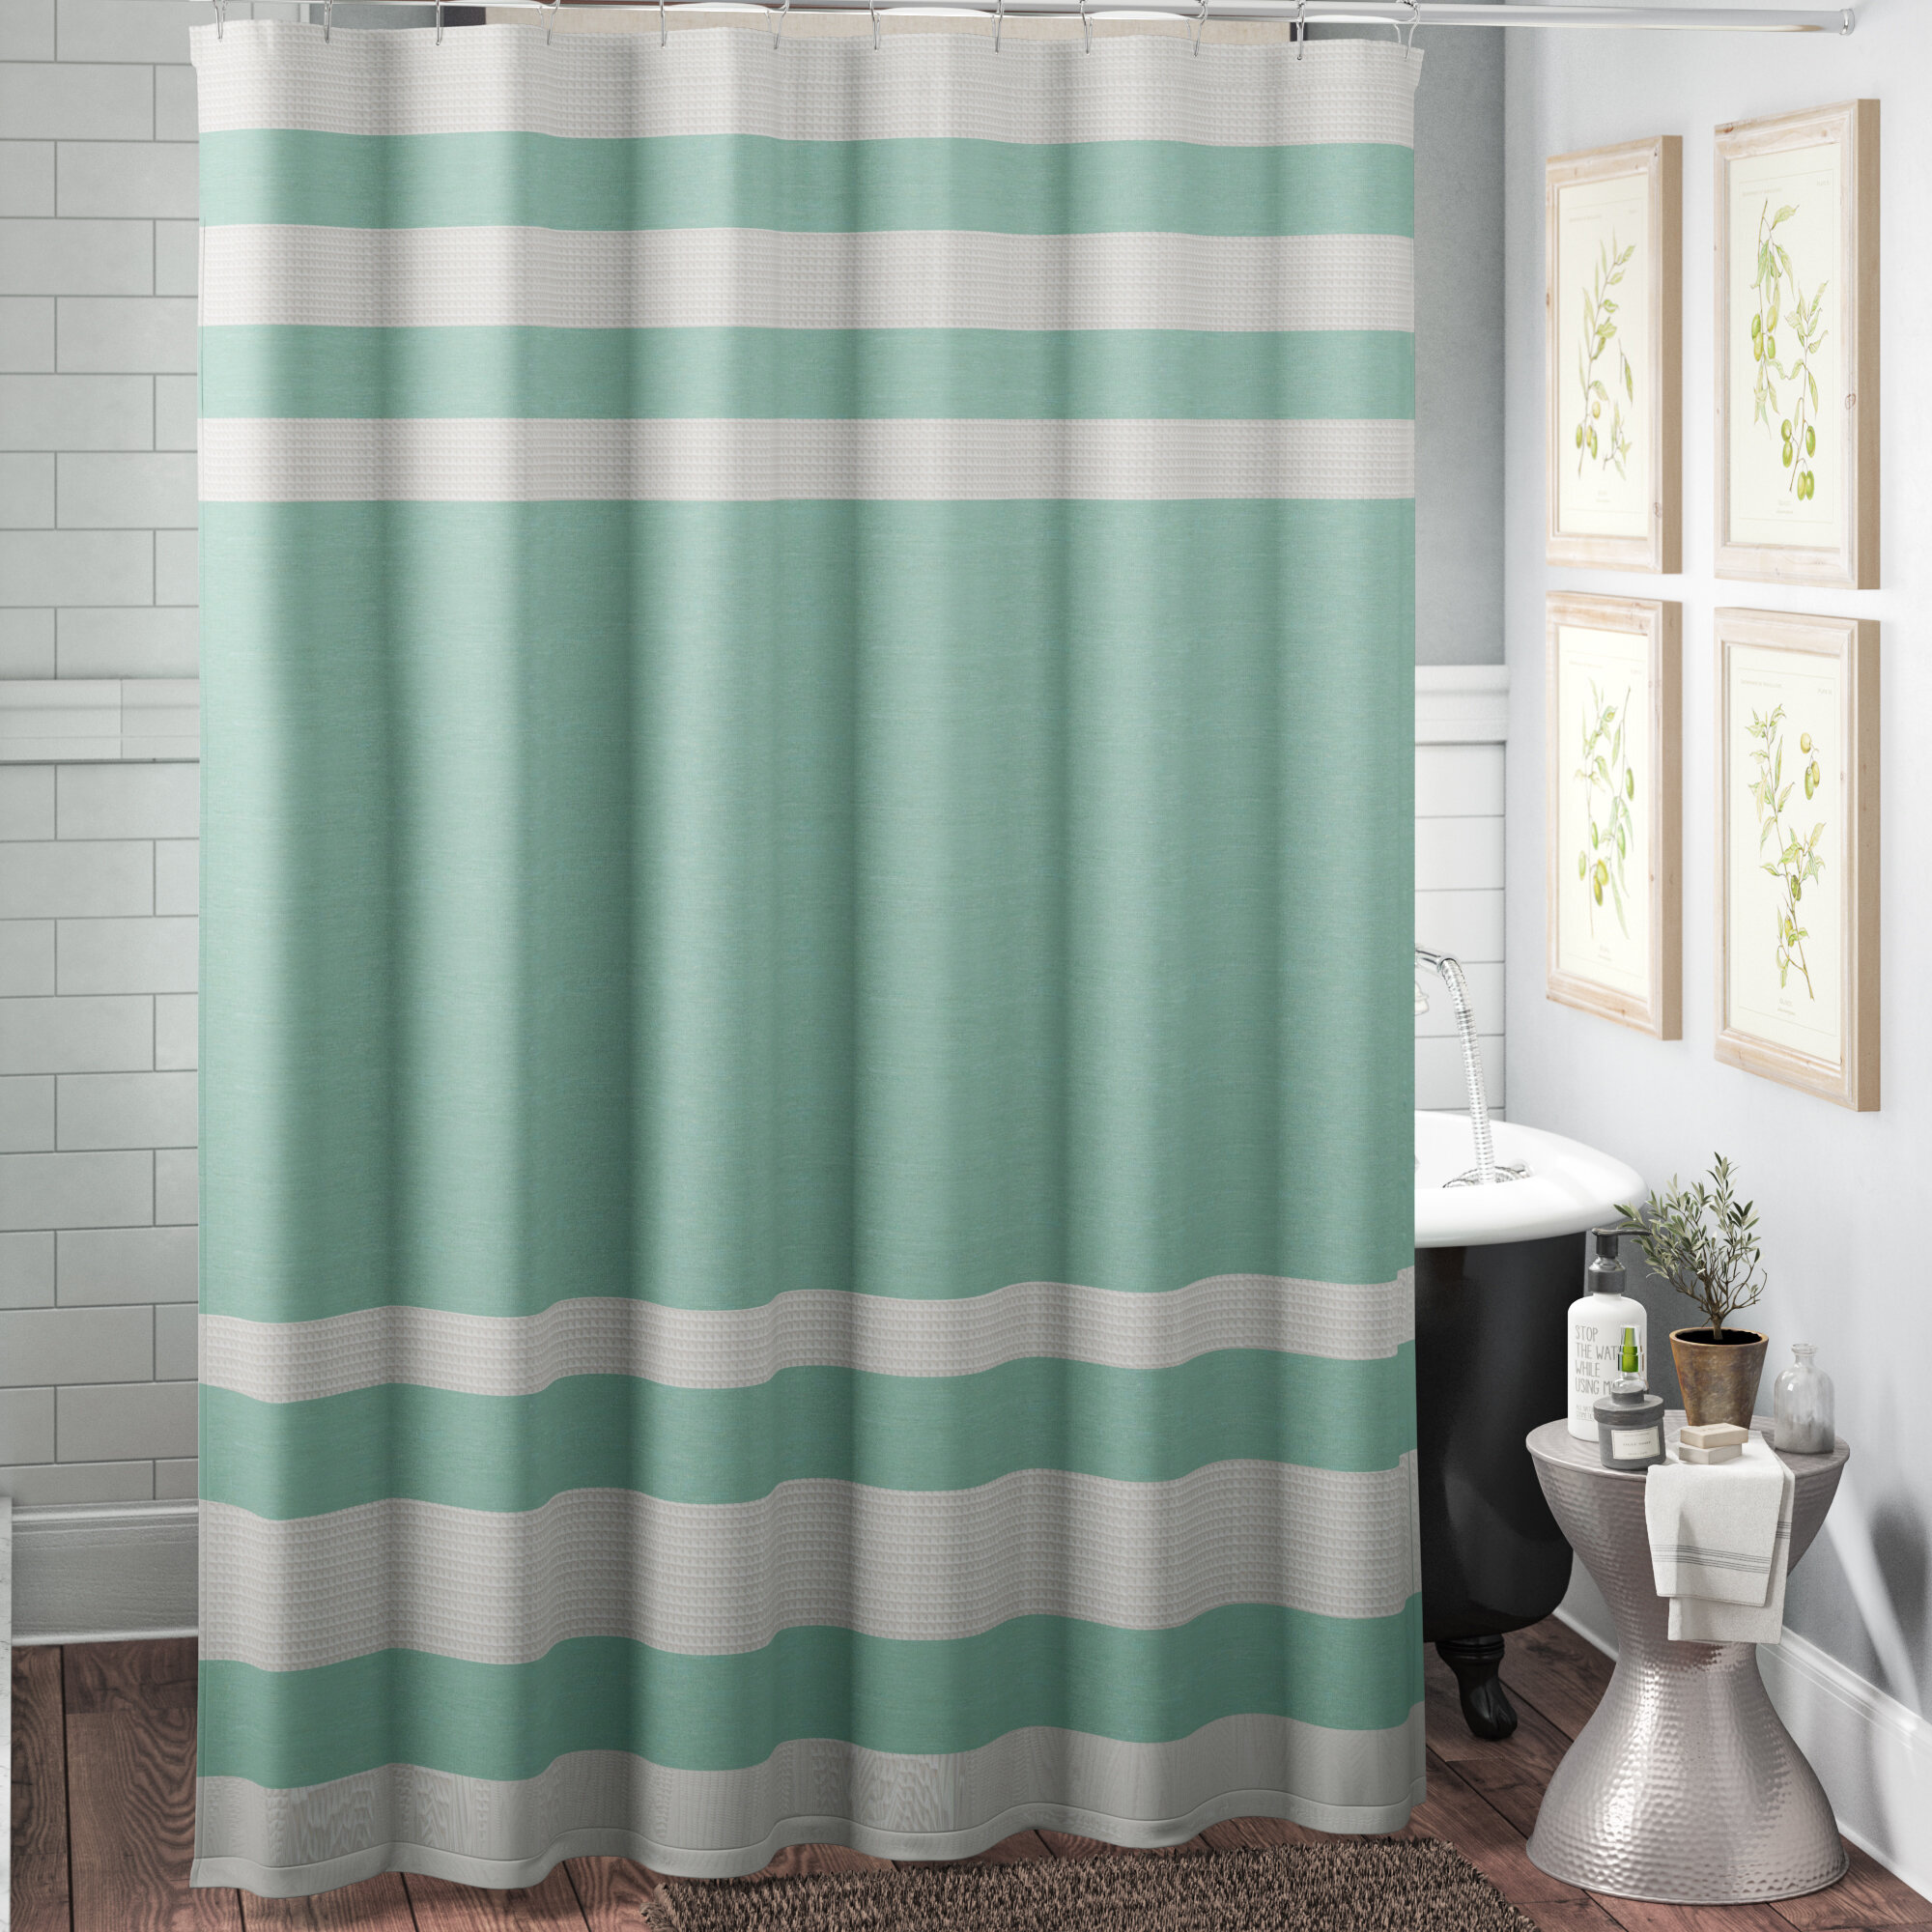 The Twillery Co Merrick Striped Single Shower Curtain Reviews Wayfair